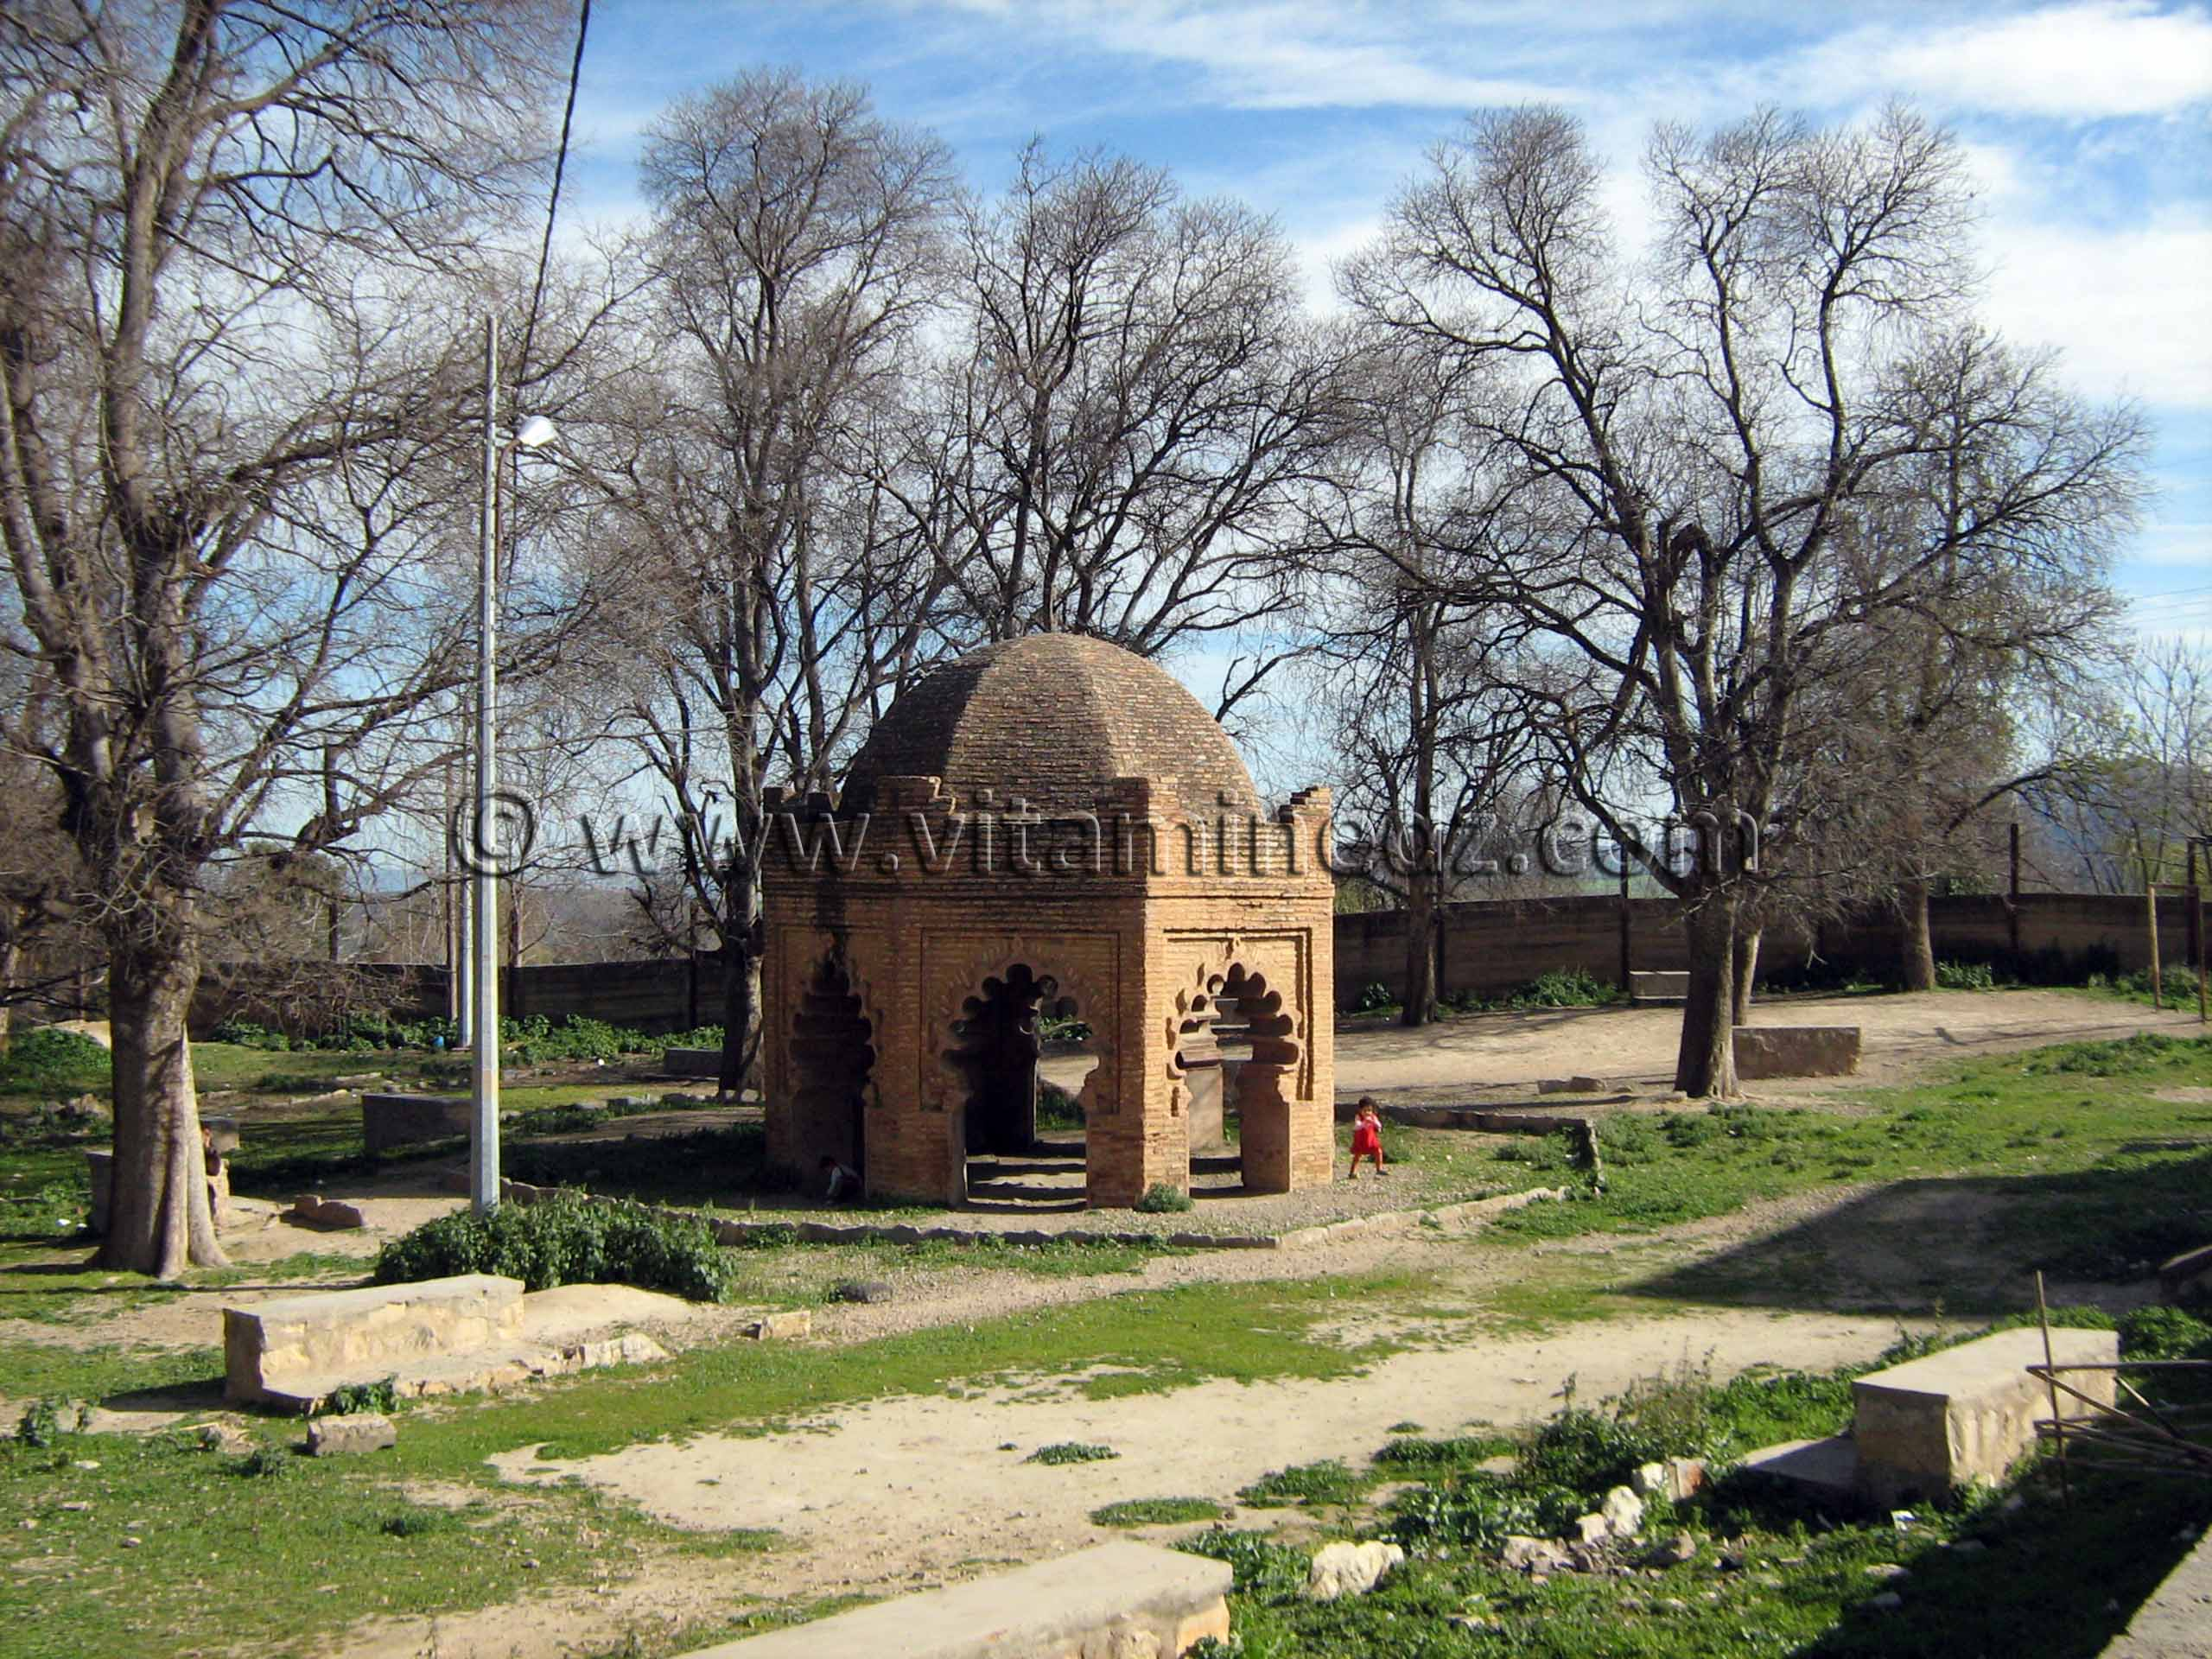 187229-photo-tlemcen-tombeau-de-la-princesse-lalla-mira.jpg